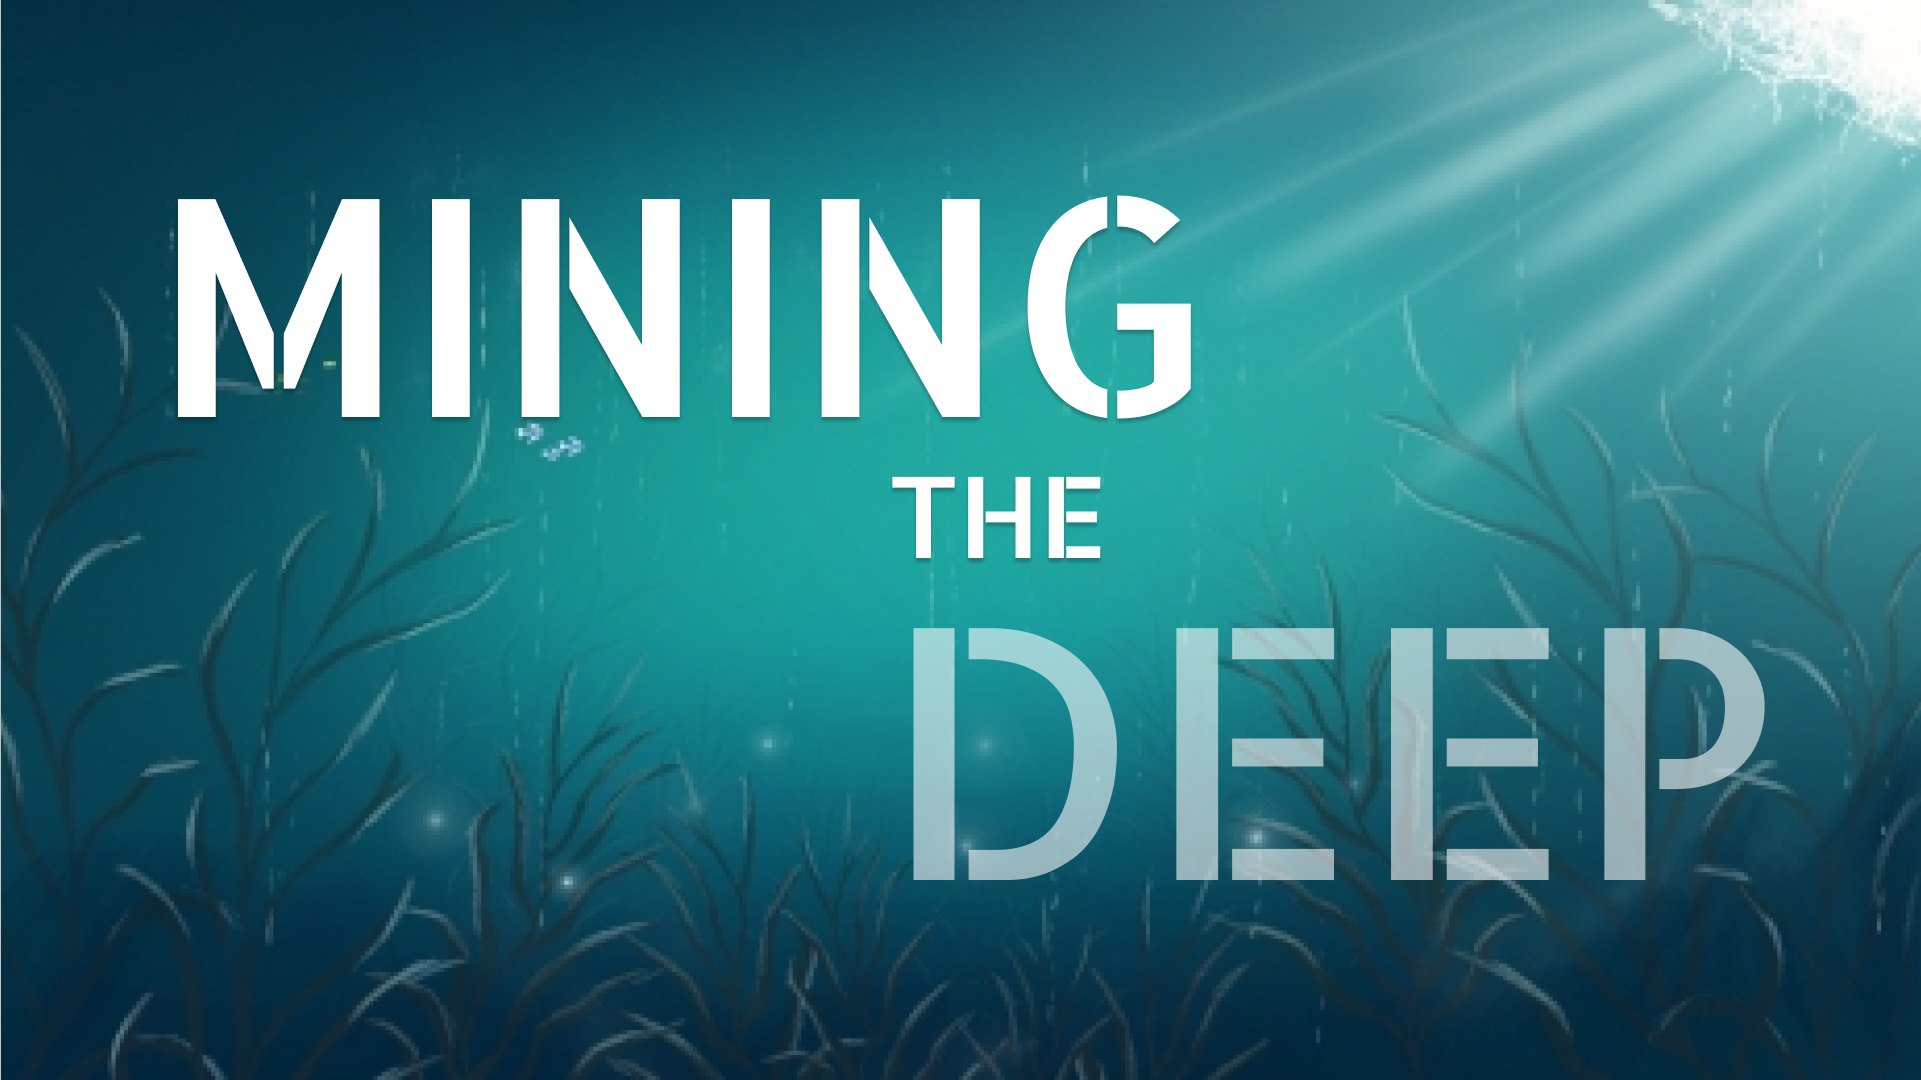 Mining the deep widescreen.png